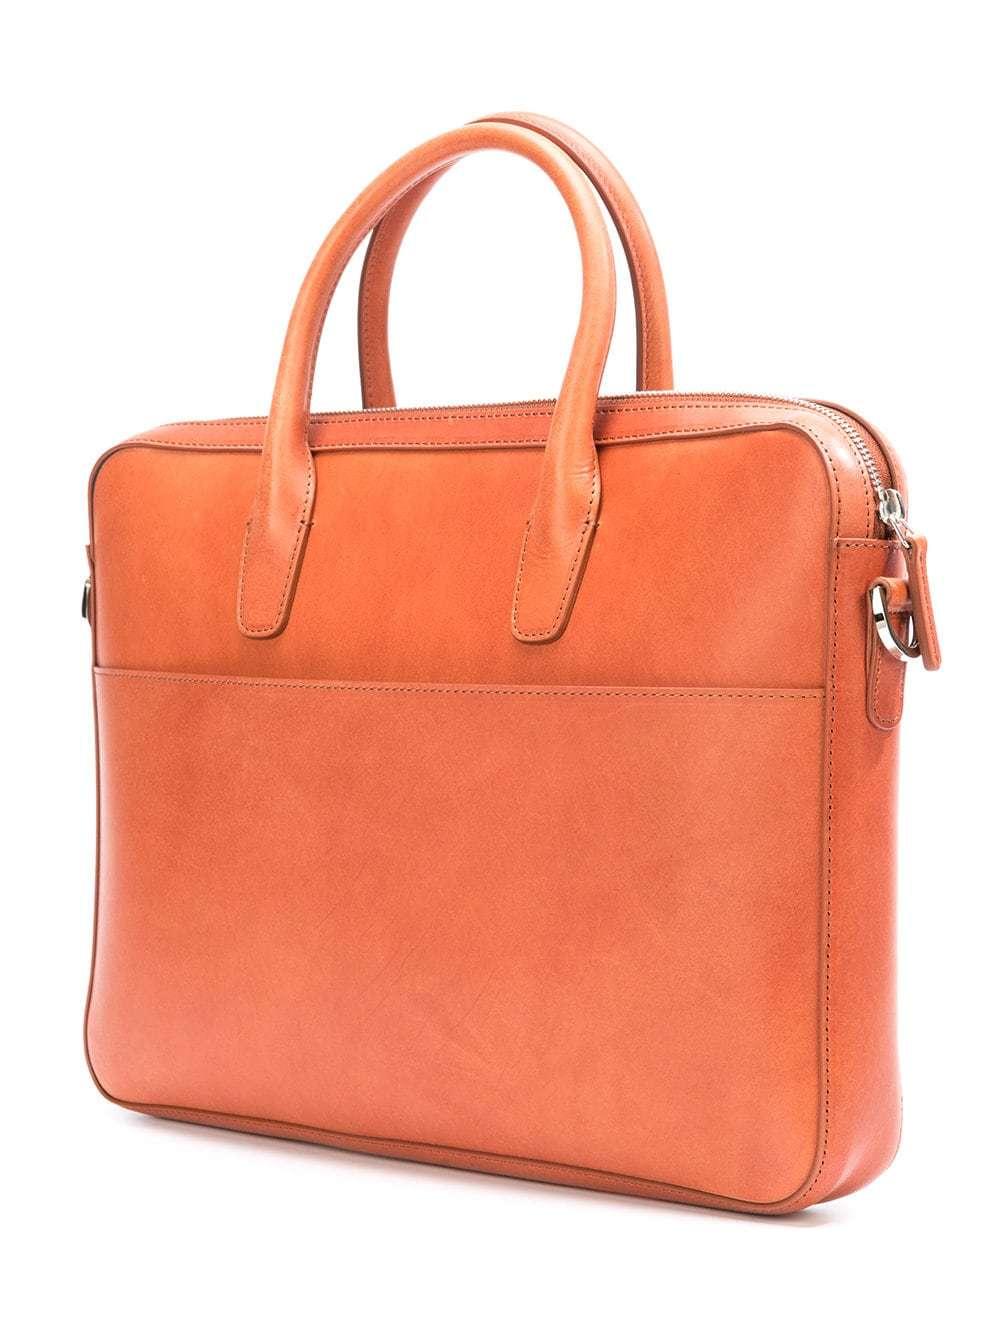 022ba4bf1 Mansur Gavriel Small Briefcase Bag, $1,039 | farfetch.com ...